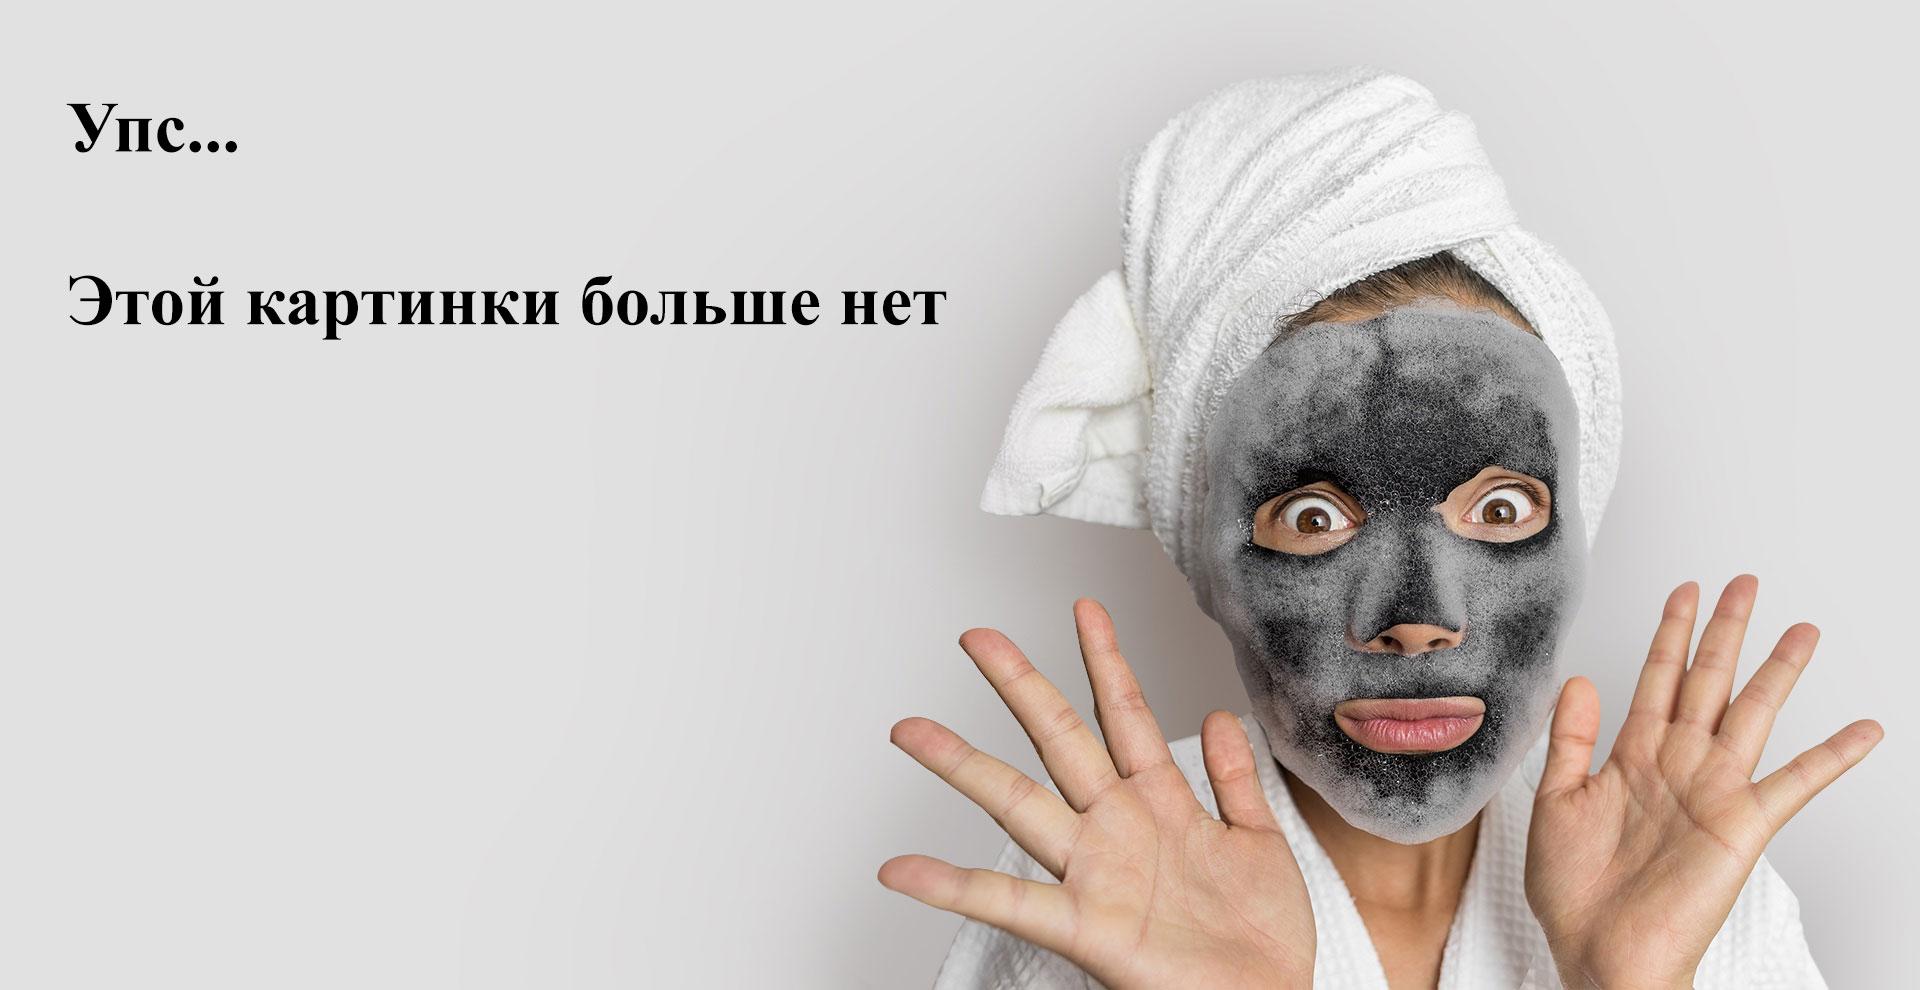 Patrisa Nail, Гель-лак Московская сага №751